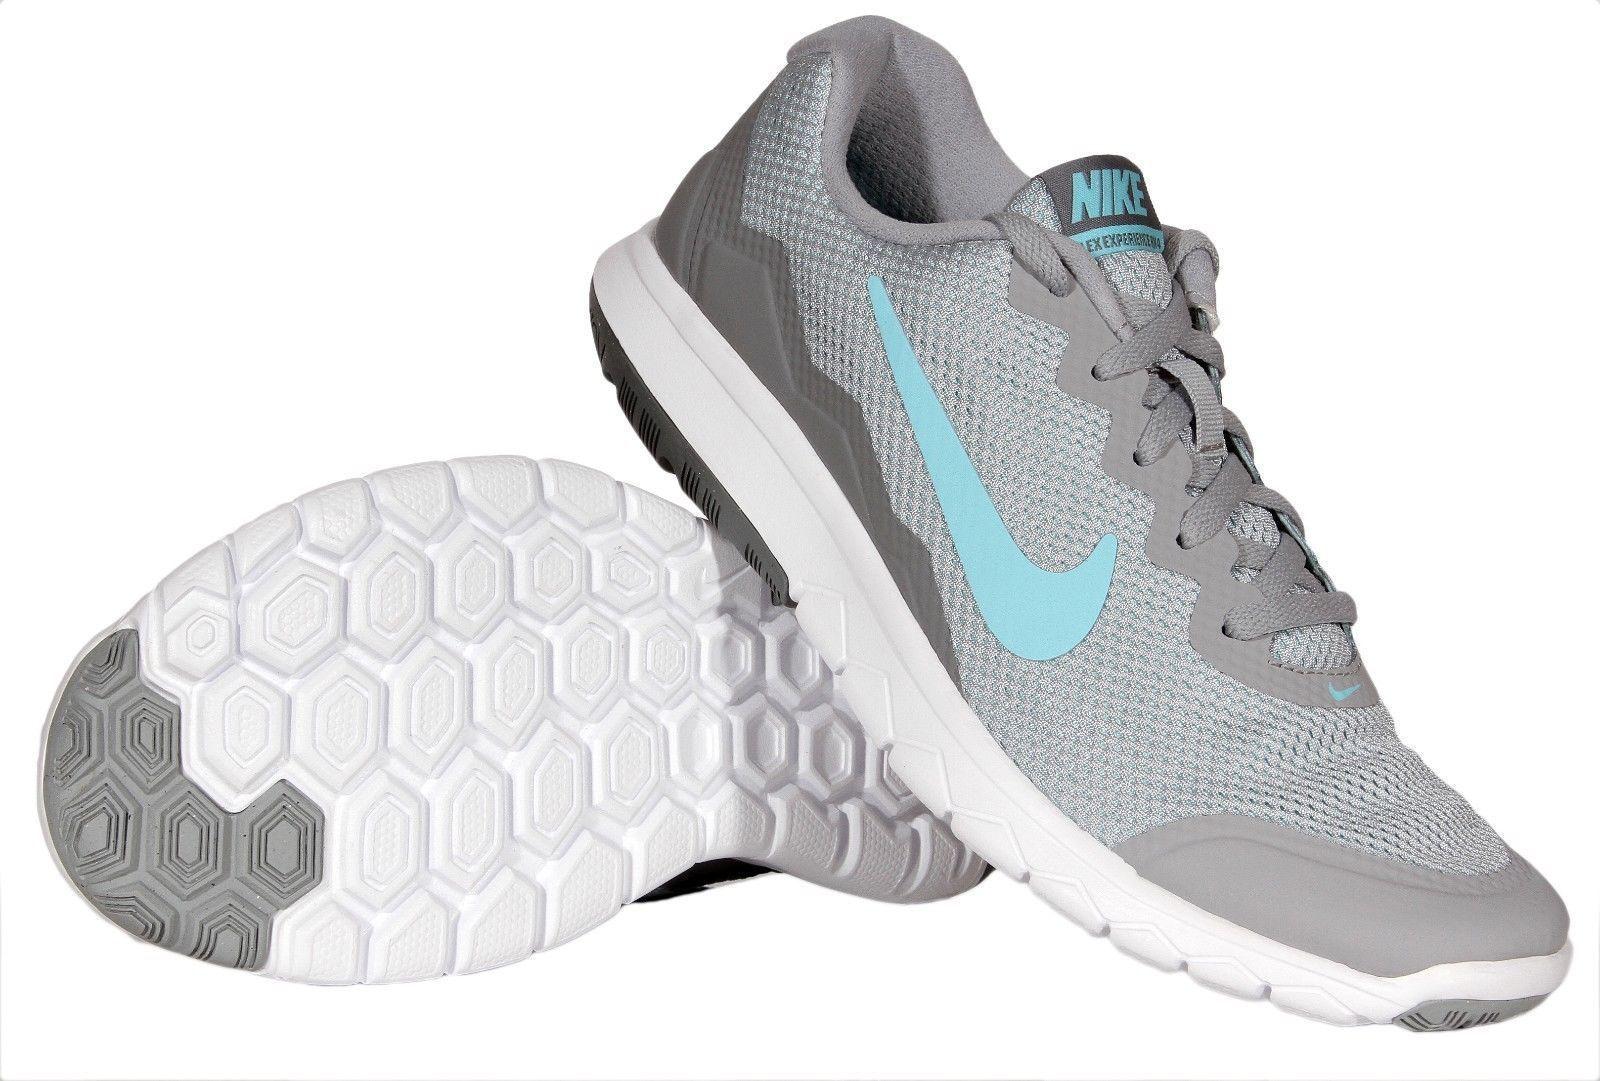 85e1ef1ac687 Brand New Womens Nike Flex Experience RN IV 749178-002 Wolf Grey Blue Sizes  7-10